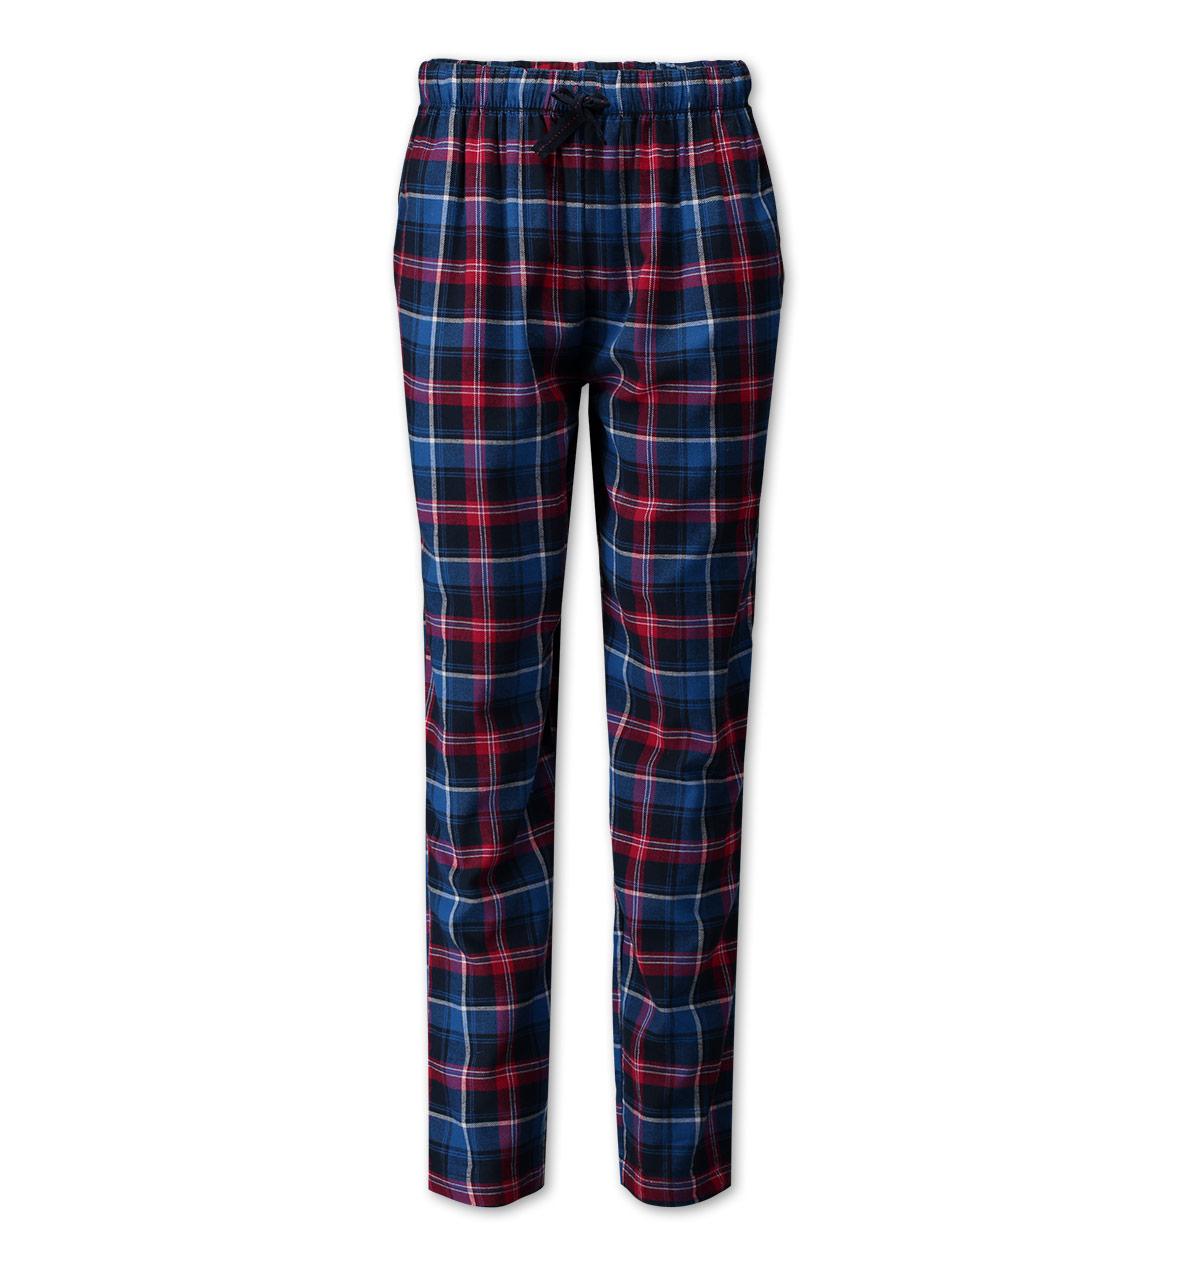 spodnie do spania dla faceta prezent